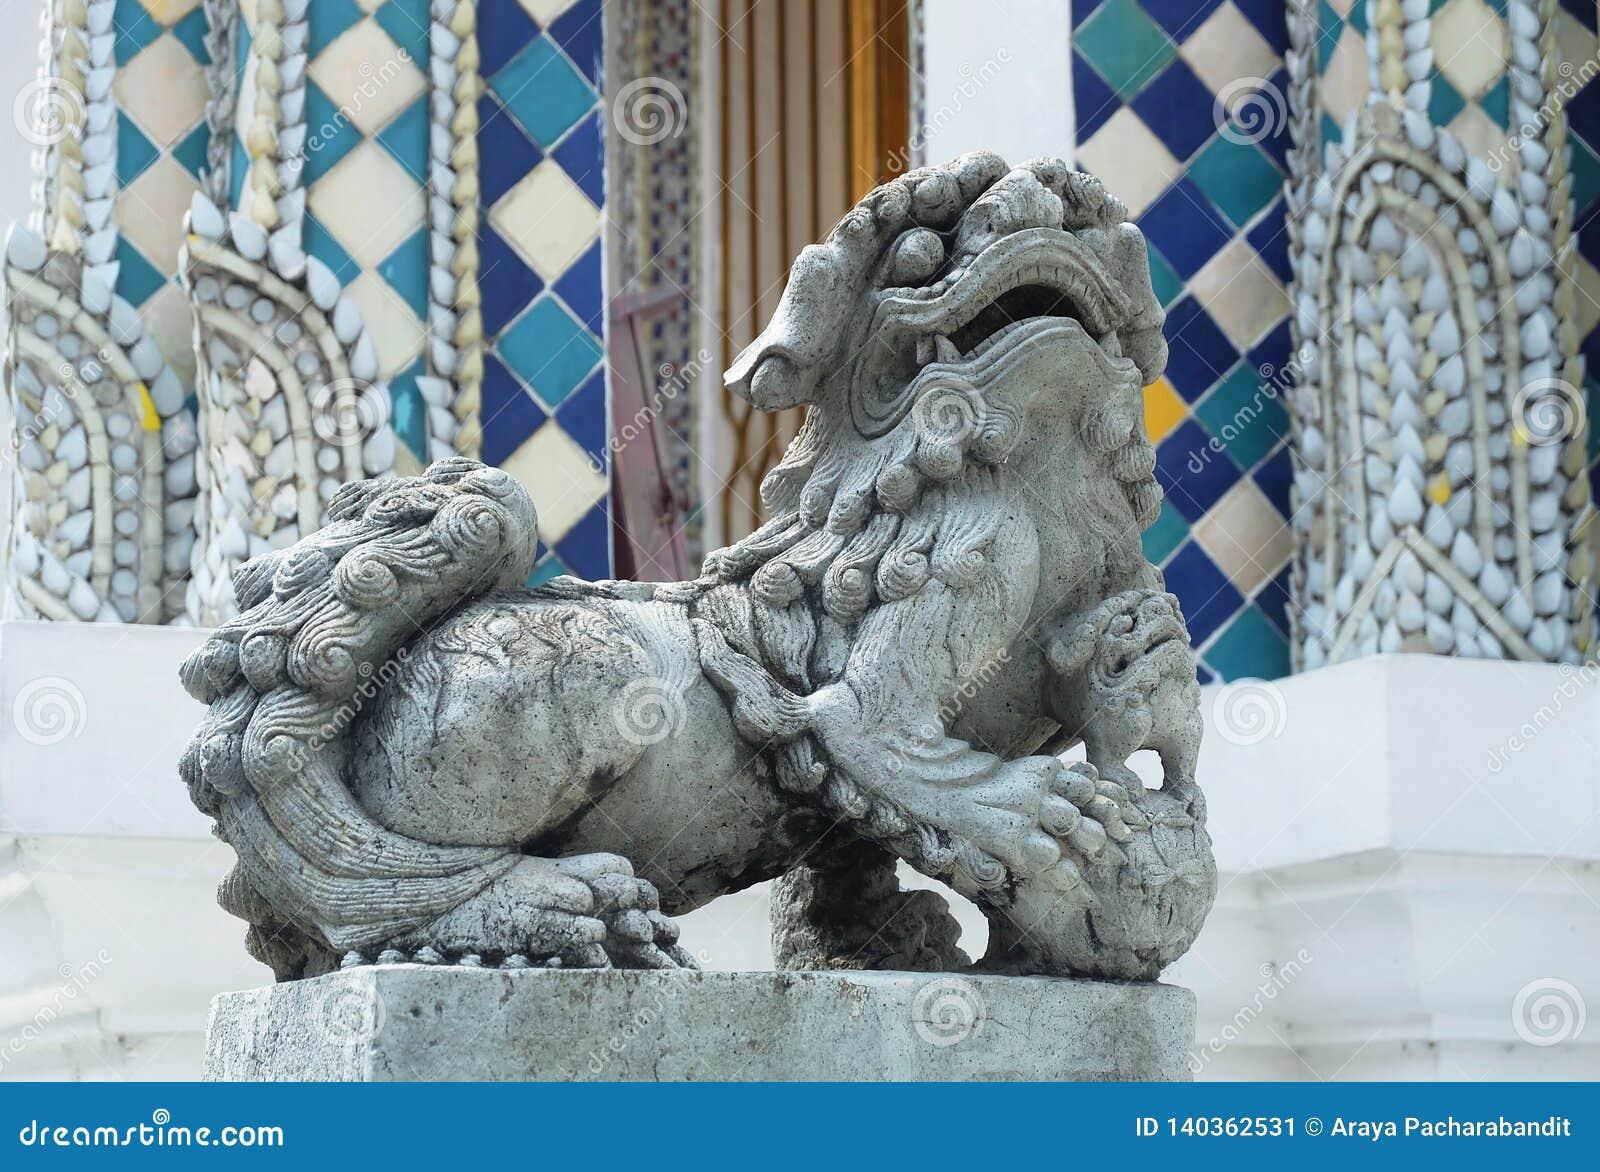 Lion Sculpture in Wat Phra Kaew at Bangkok, Thailand